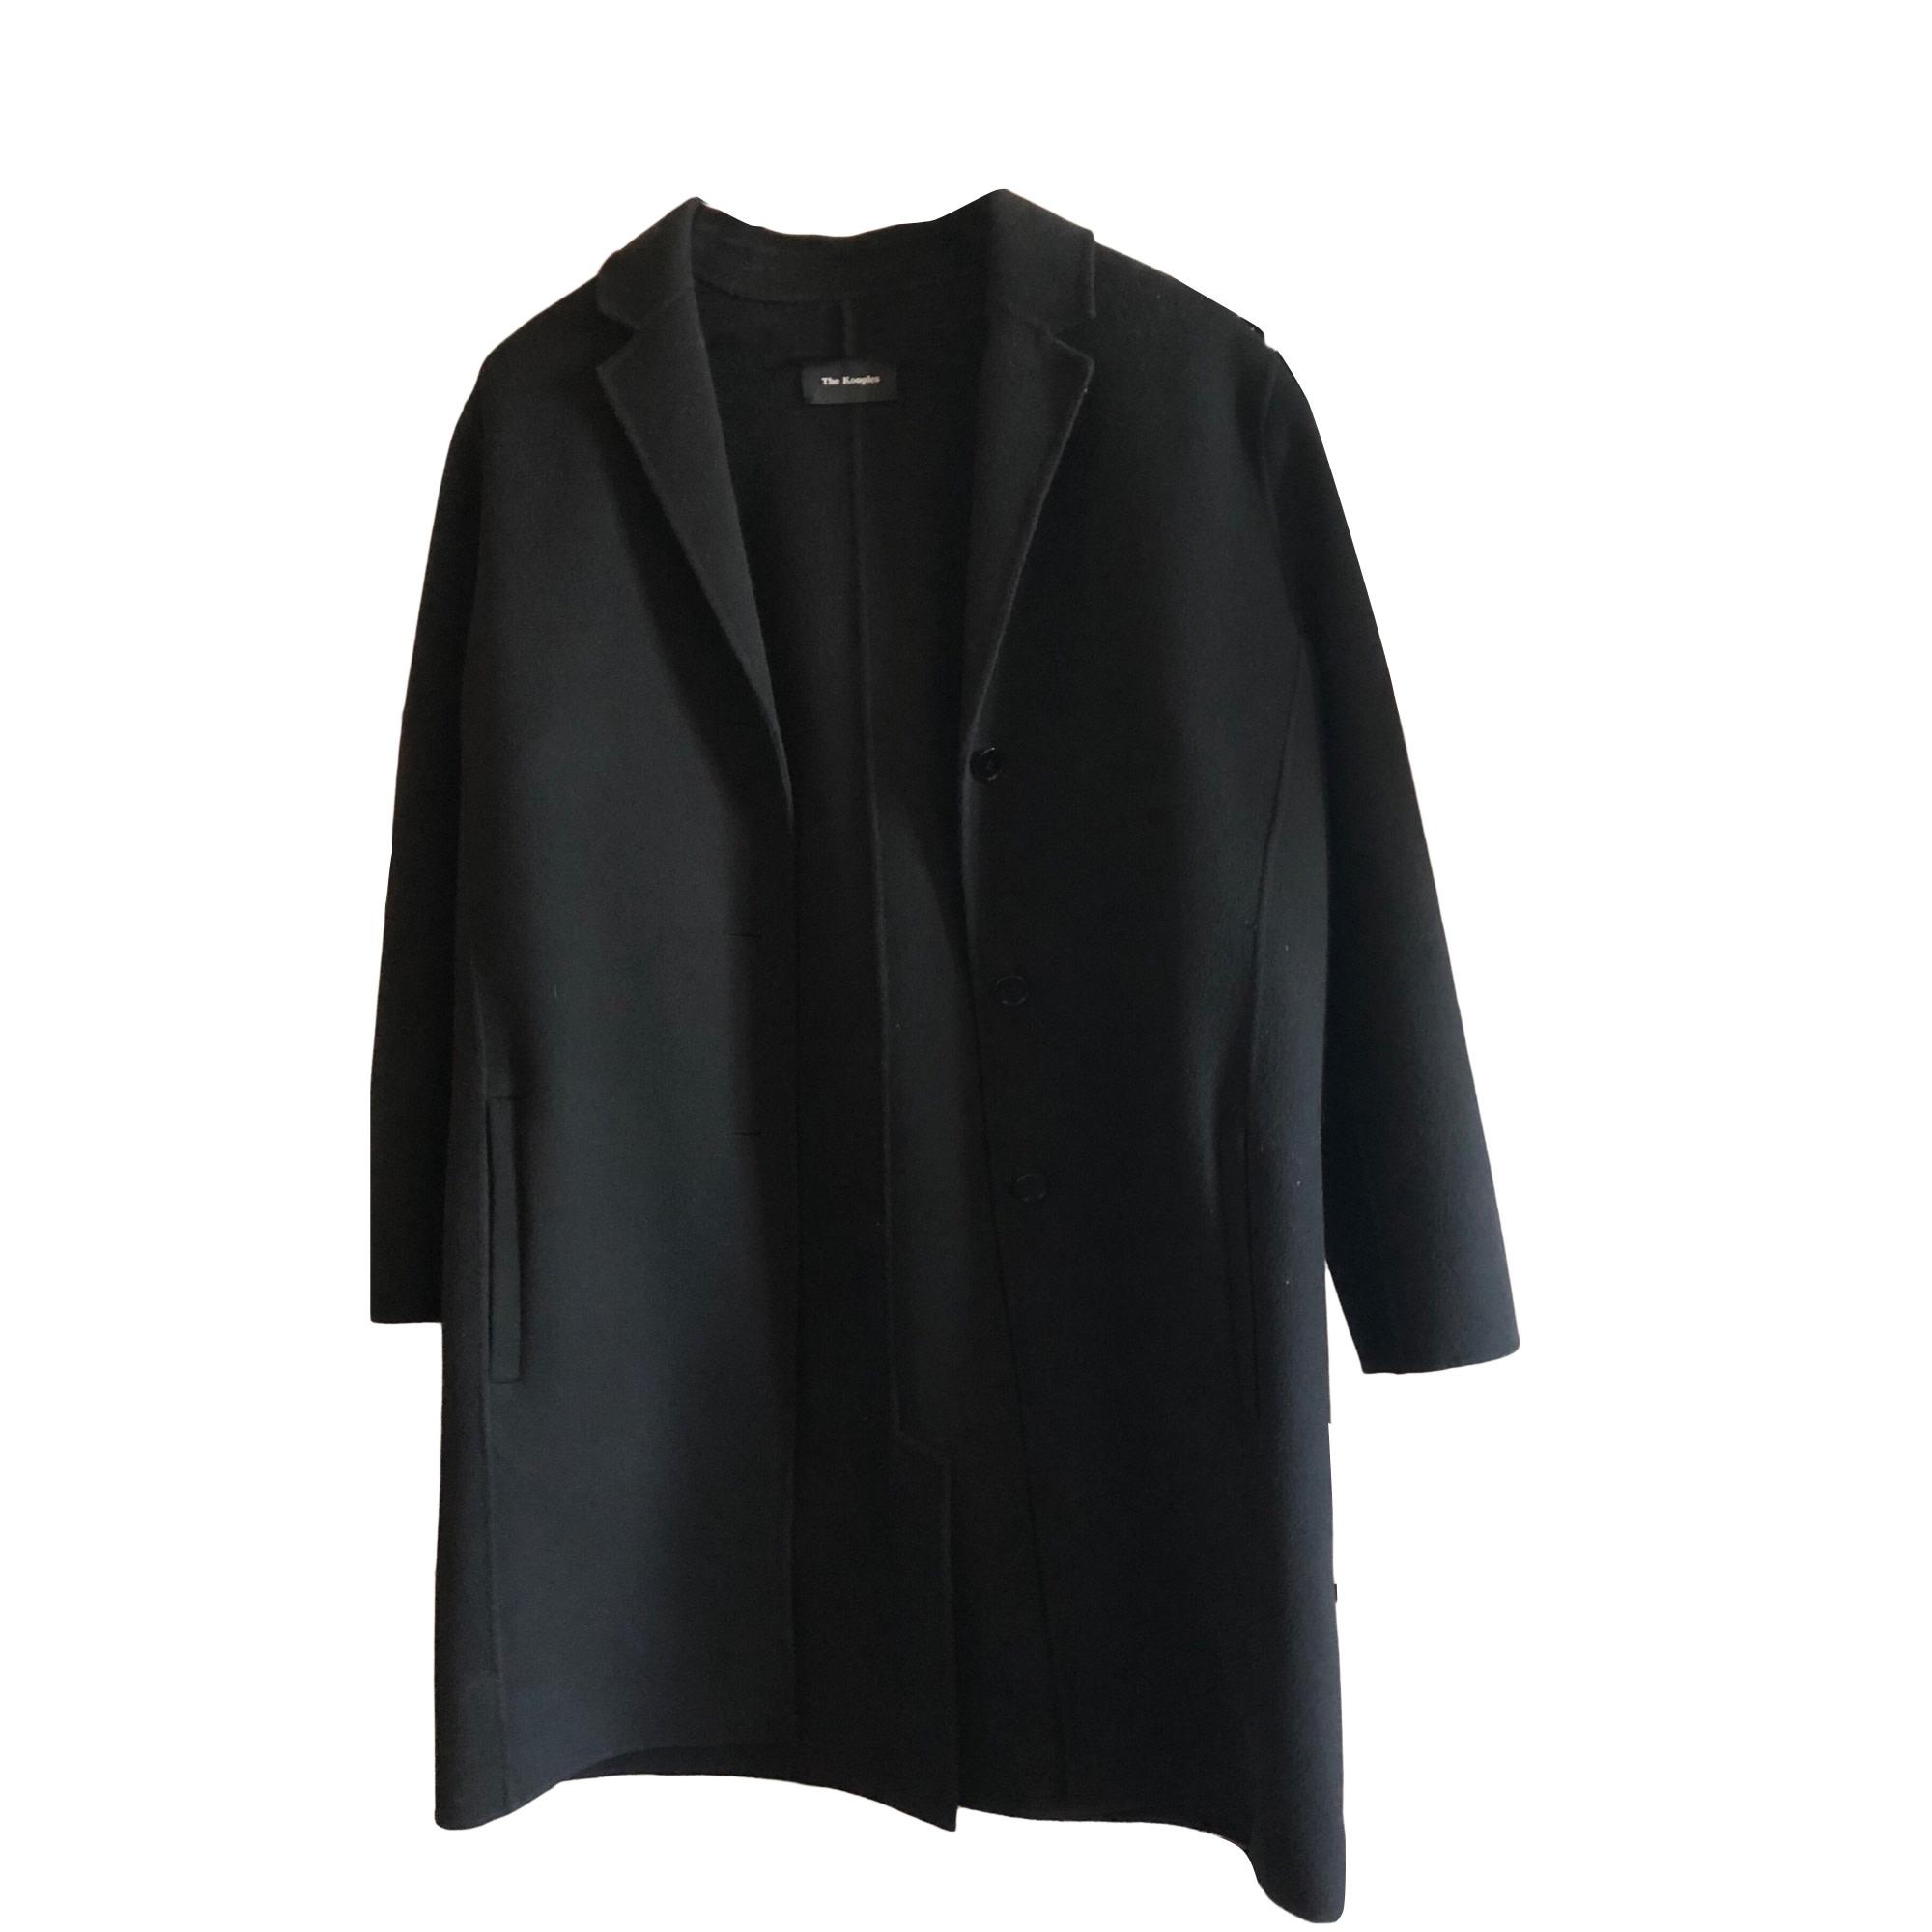 KOOPLES vendu Manteau T3 40 noir Zoeela24249 par 7919862 THE L rnYqR5xWwY